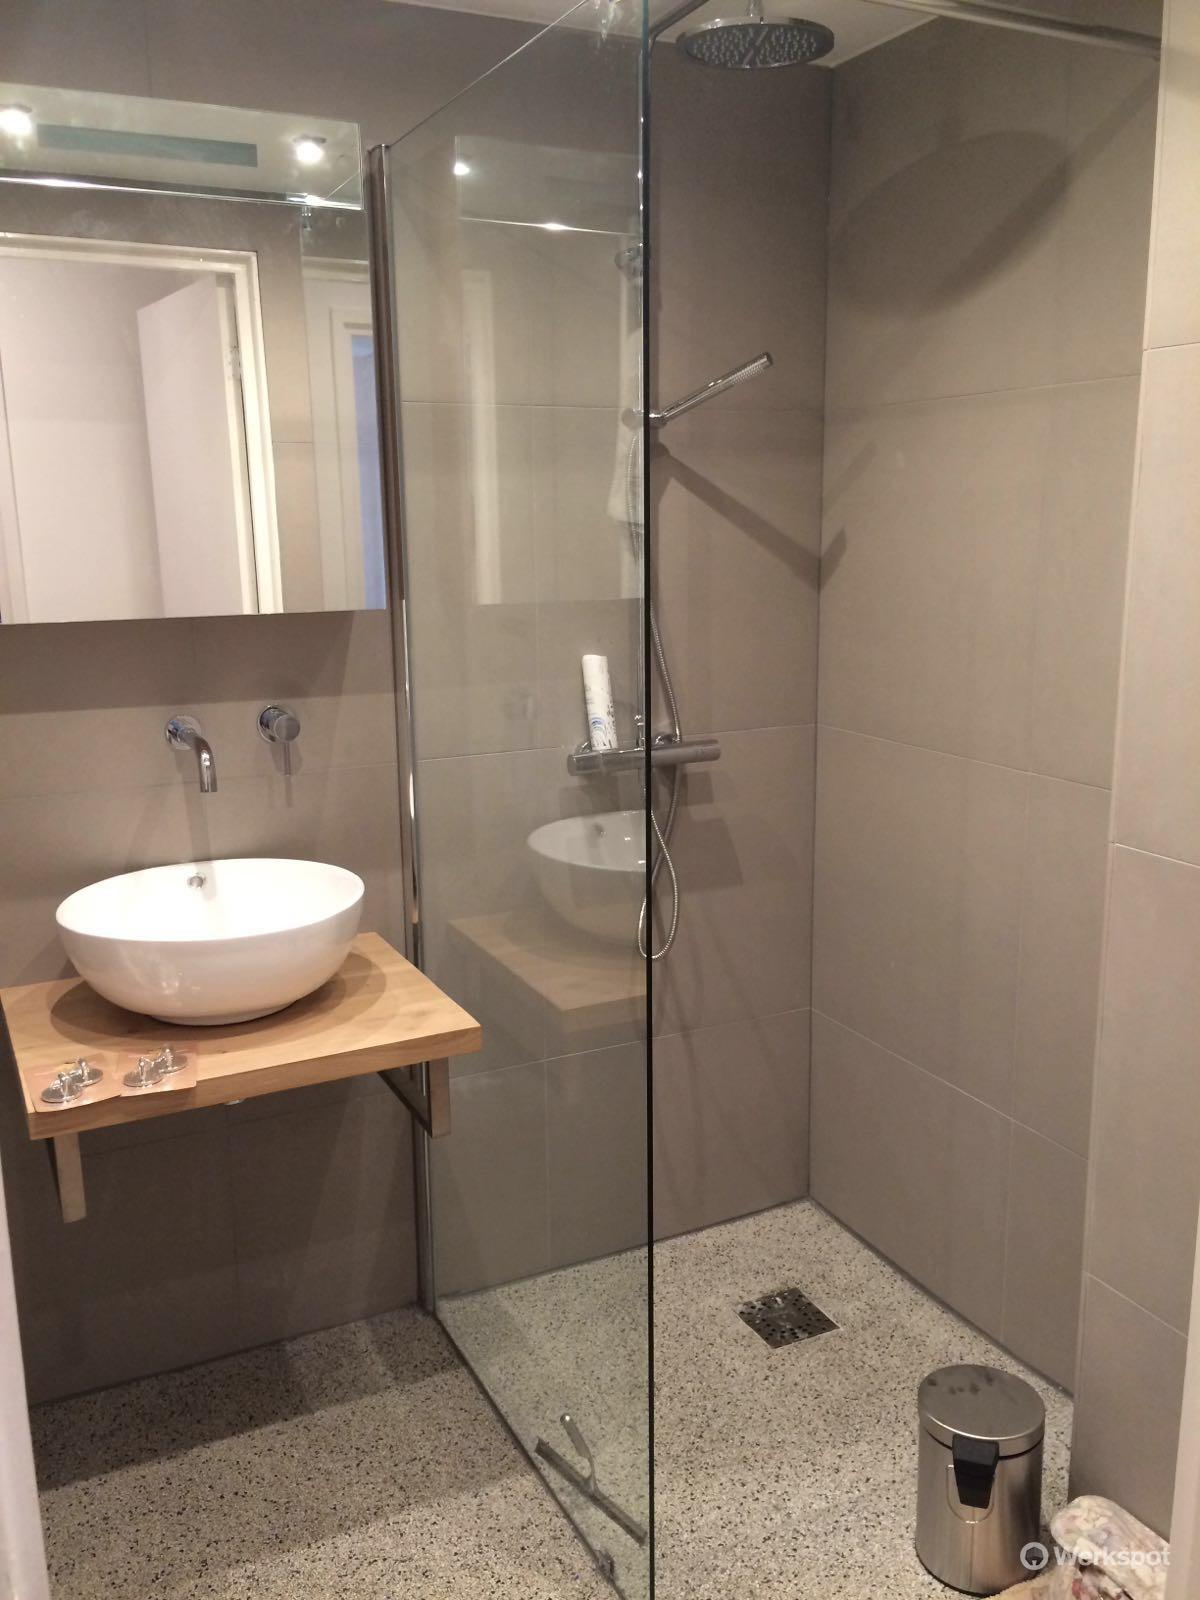 Verbouwing Appartement Amsterdam (Badkamer, WC en overig) - Werkspot